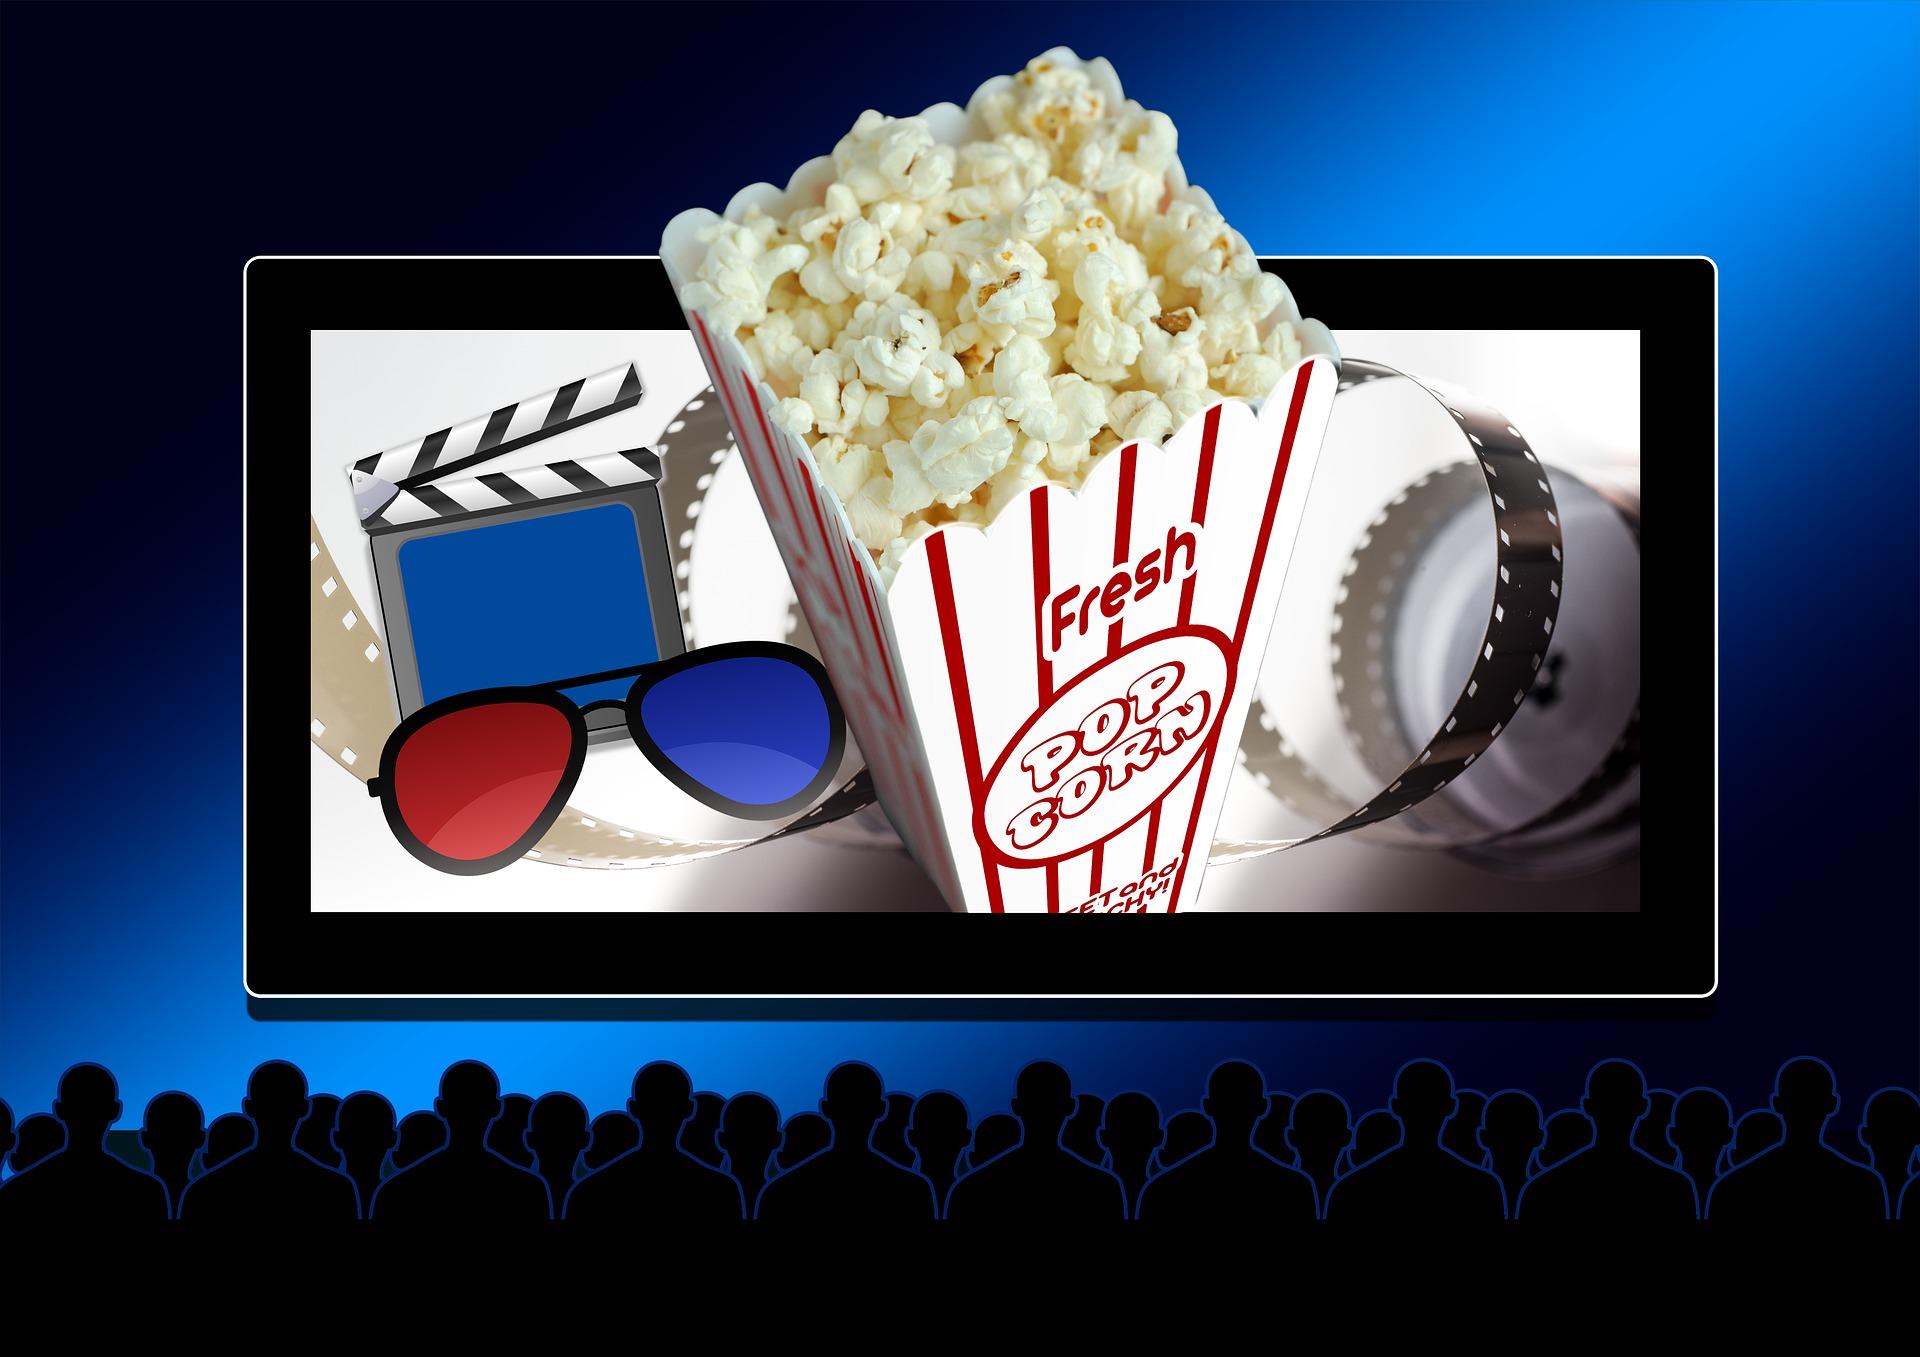 cinema-3001163_1920